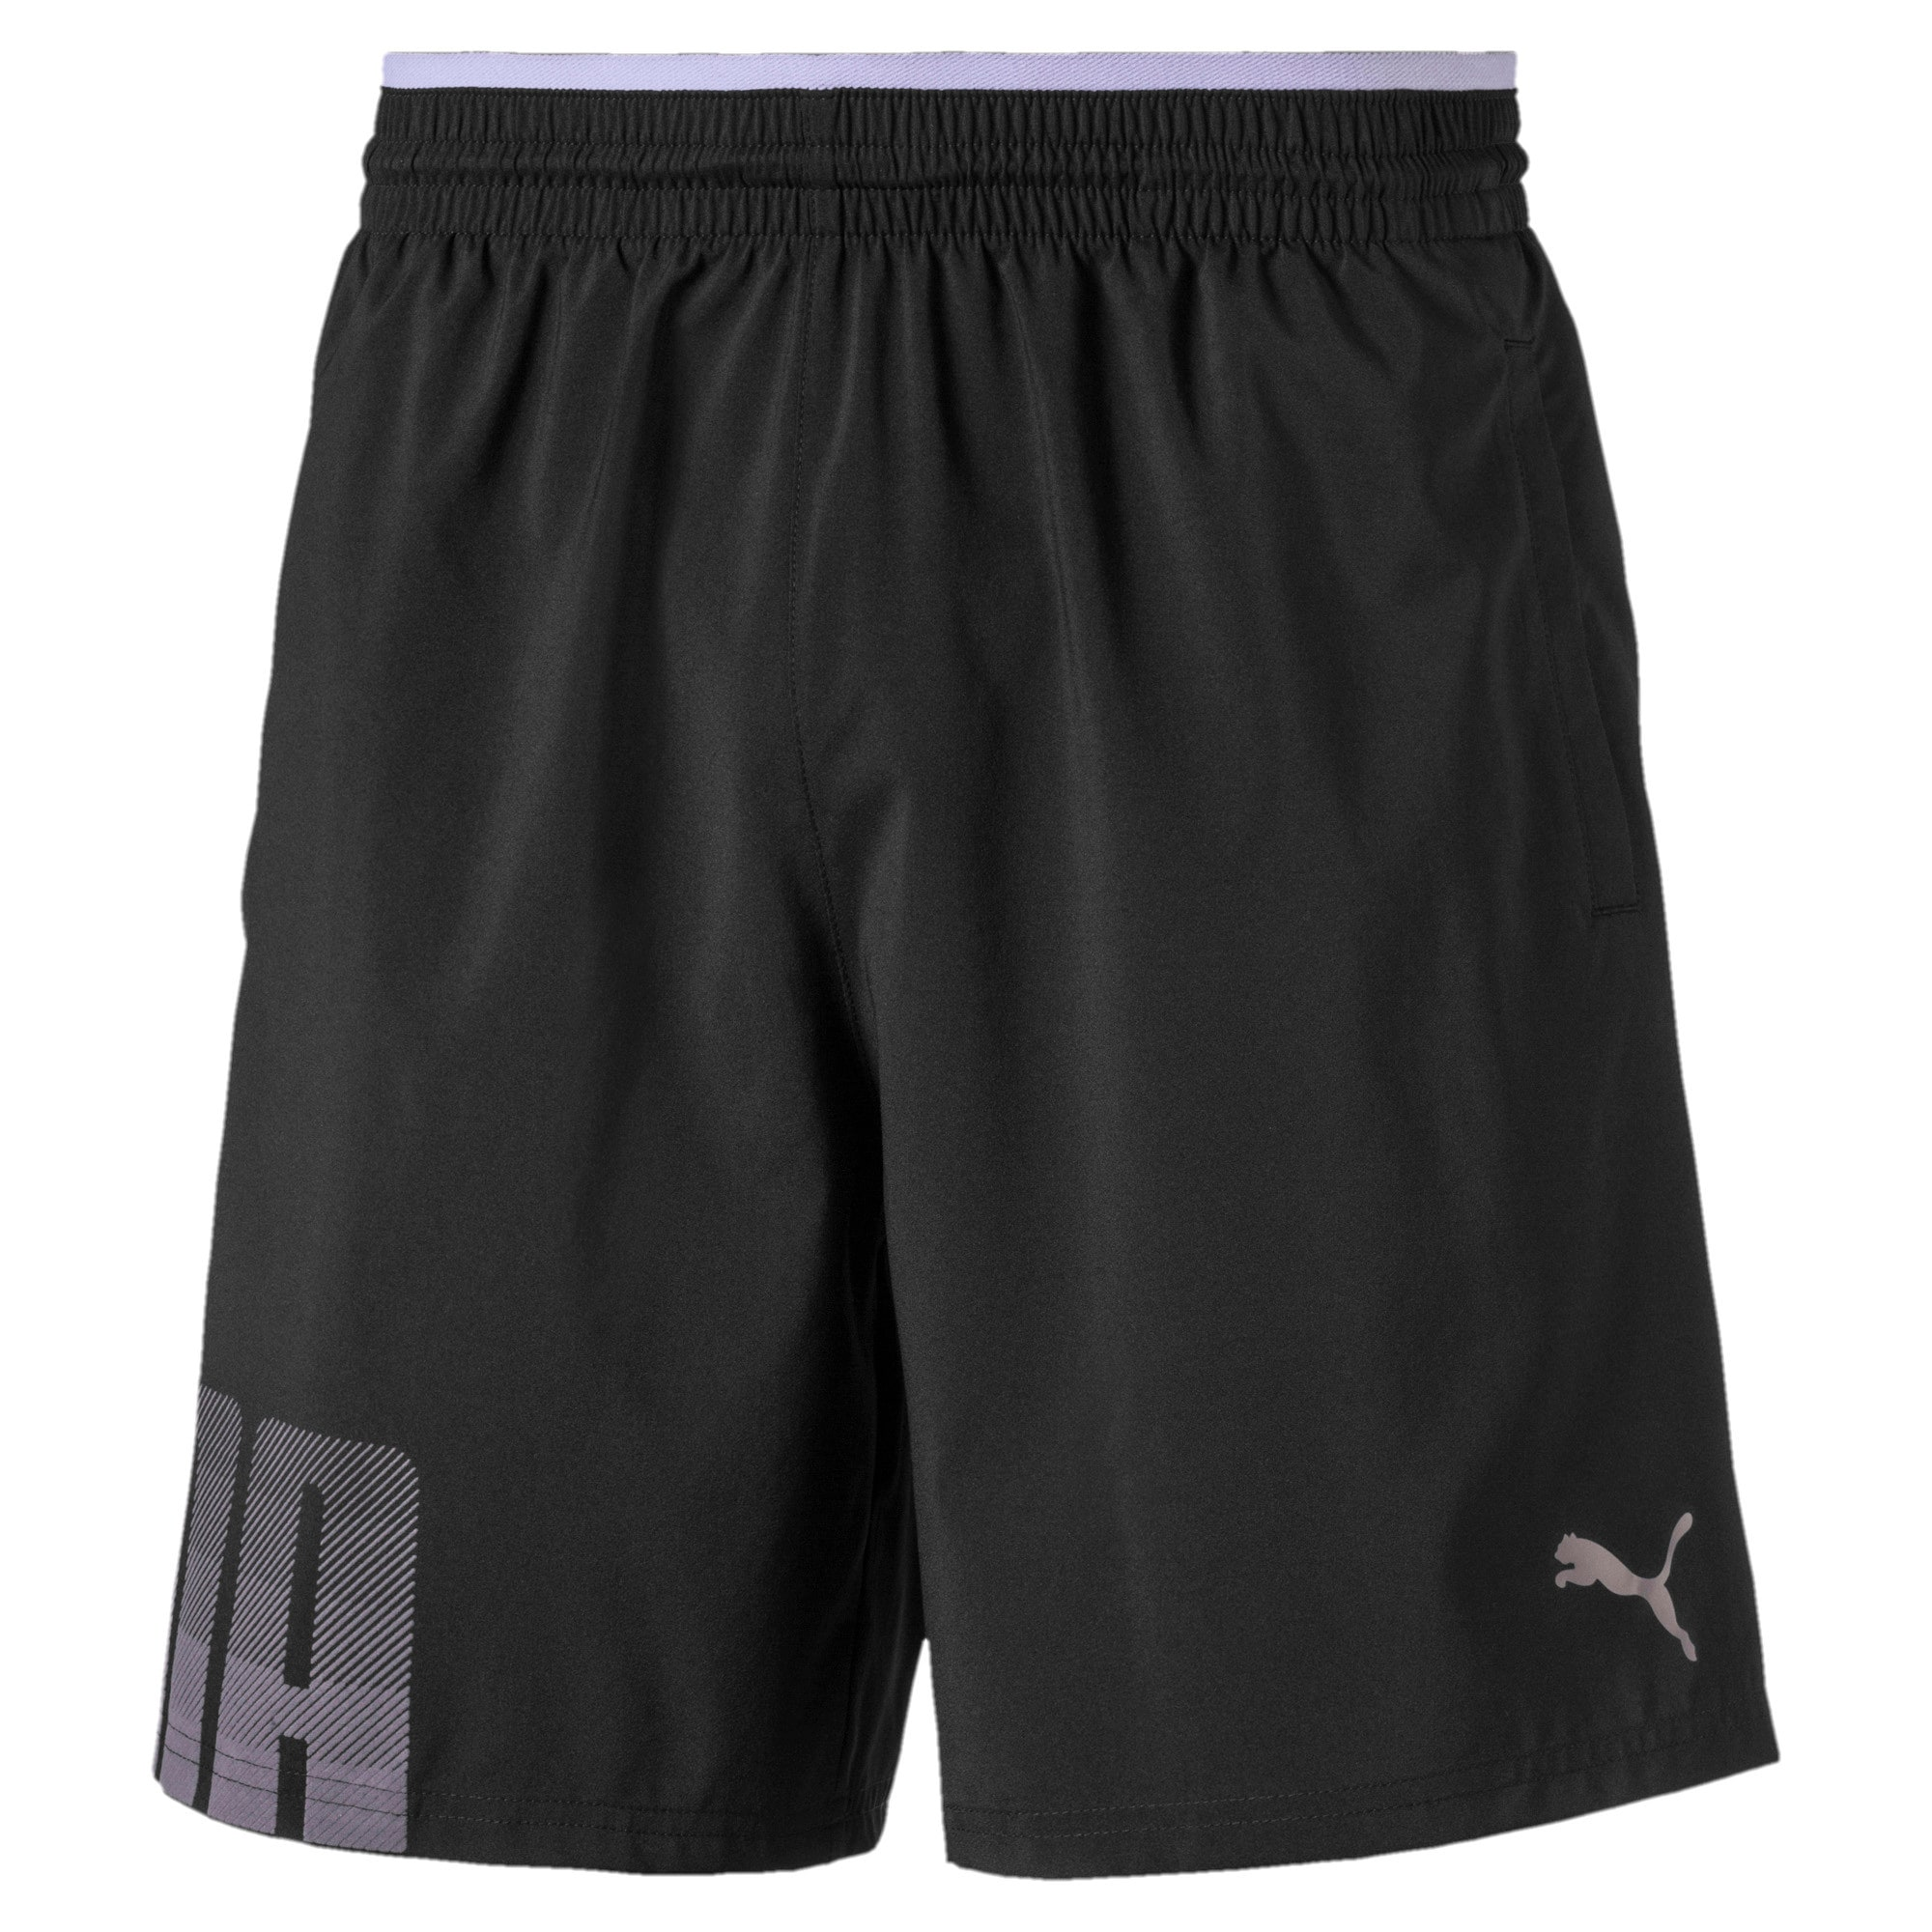 Miniatura 4 de Shorts de punto Collective para hombre, Puma Black, mediano